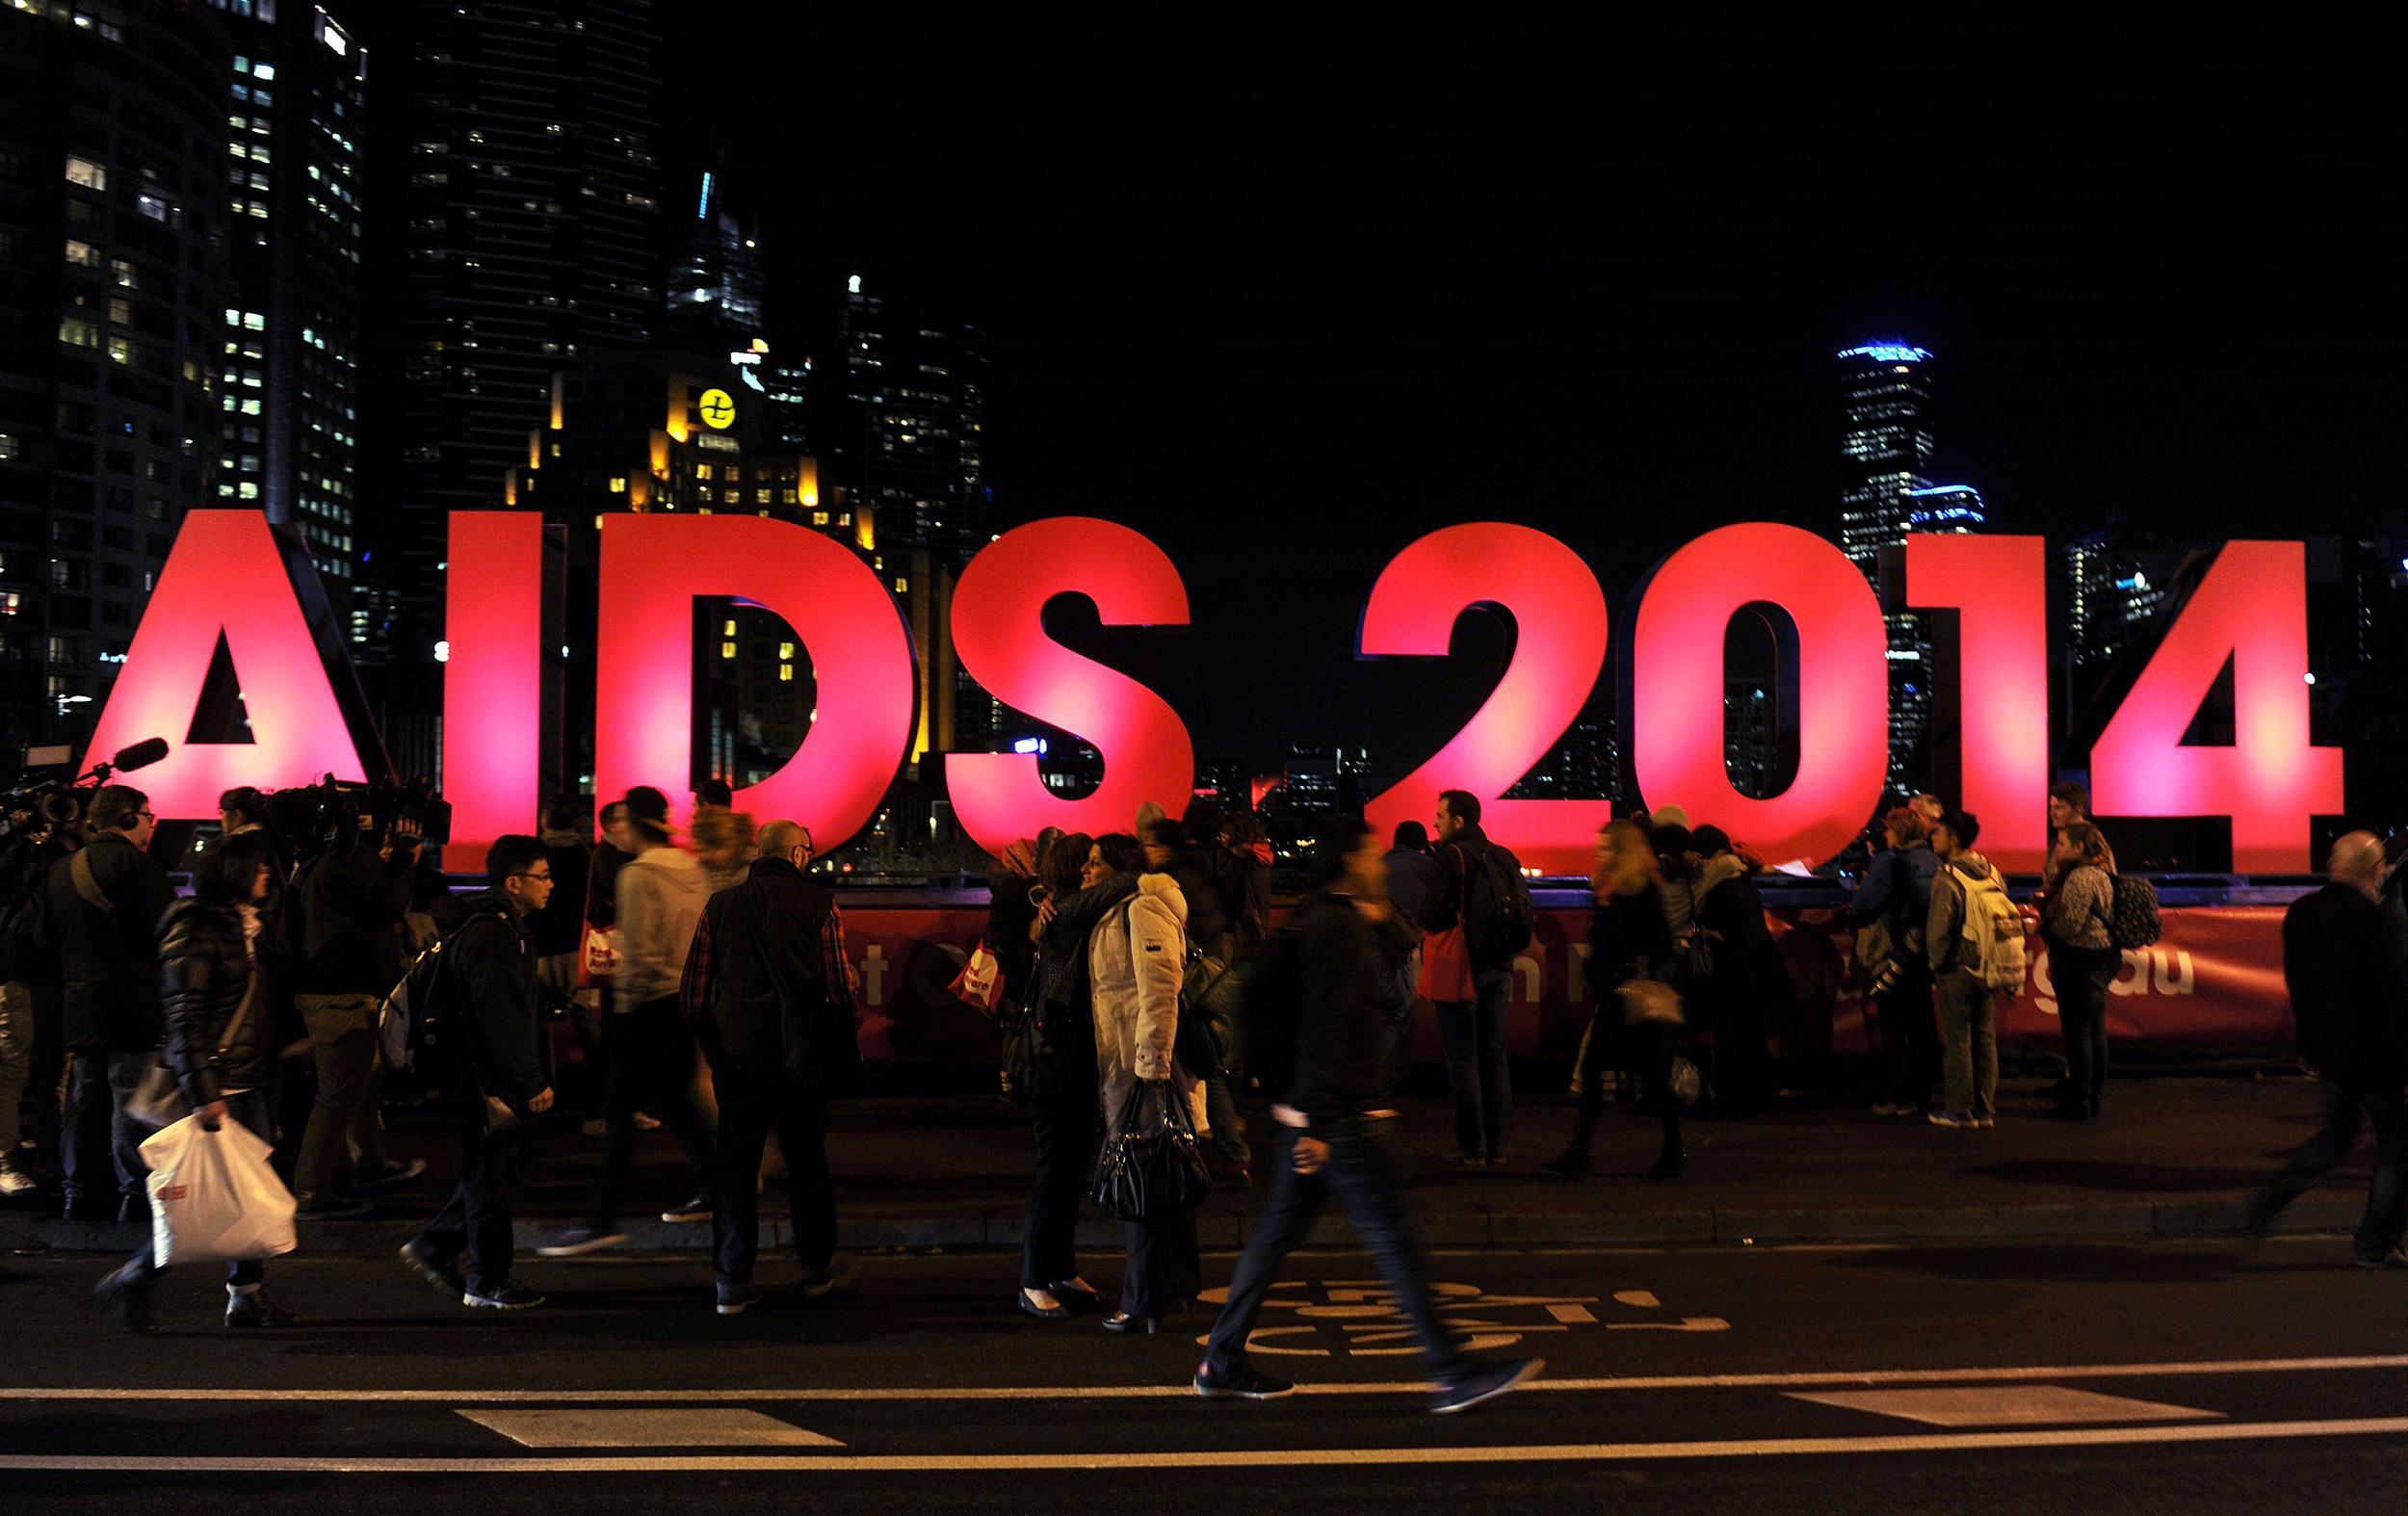 140721-aids-conference-main-1748_f0418d170d42cccd916a60216298a09f.jpg